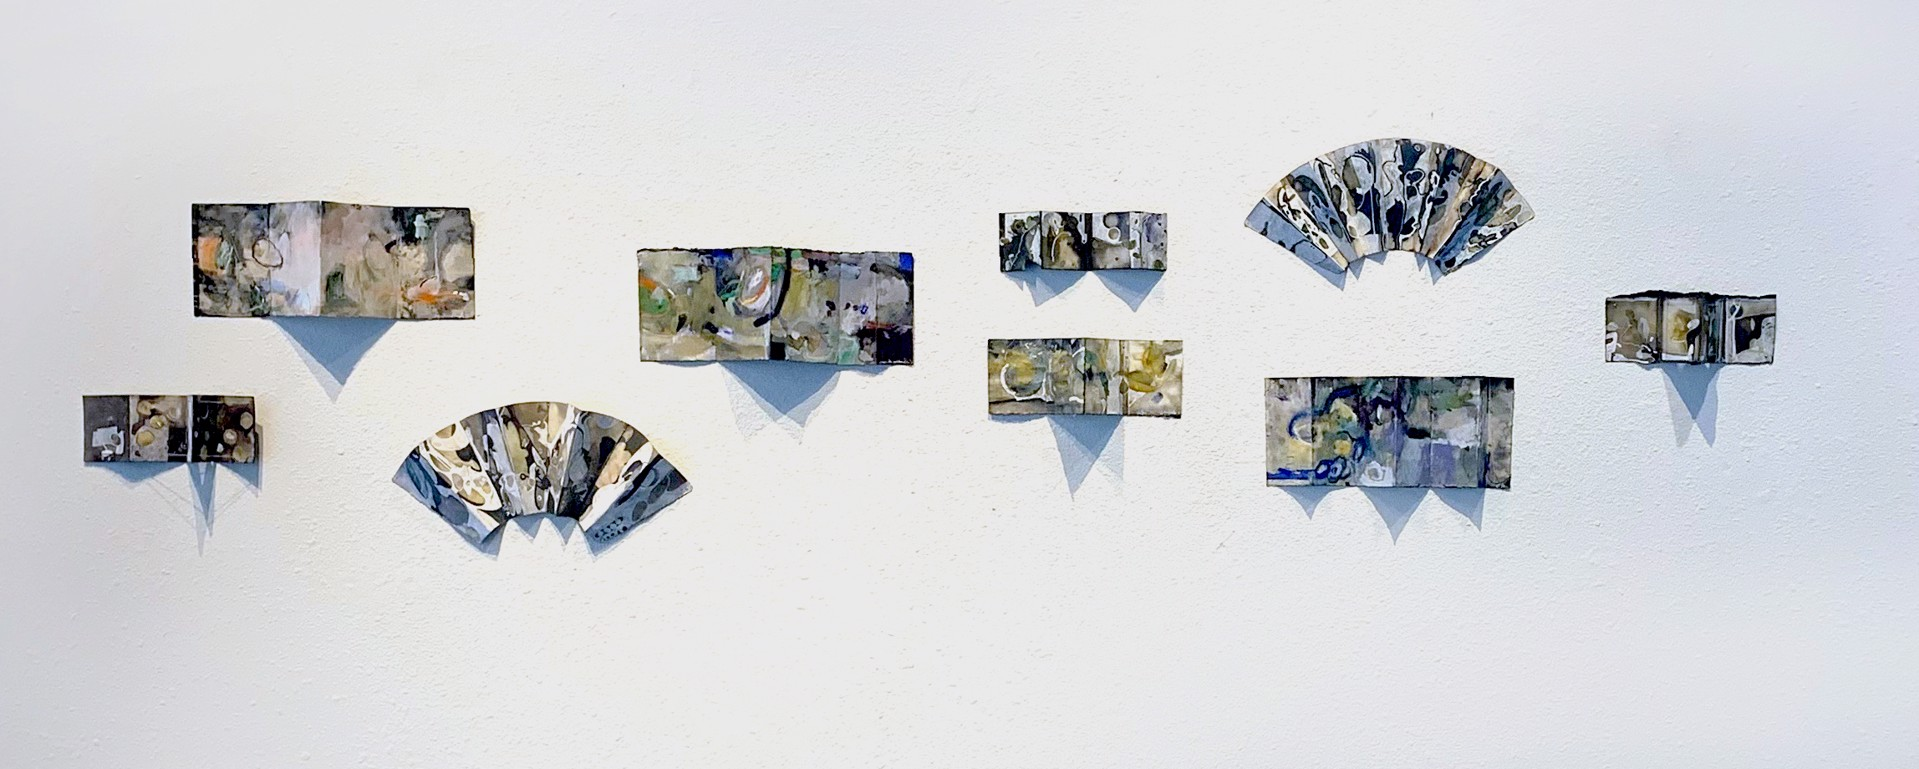 Pile-Up by Caryn Friedlander